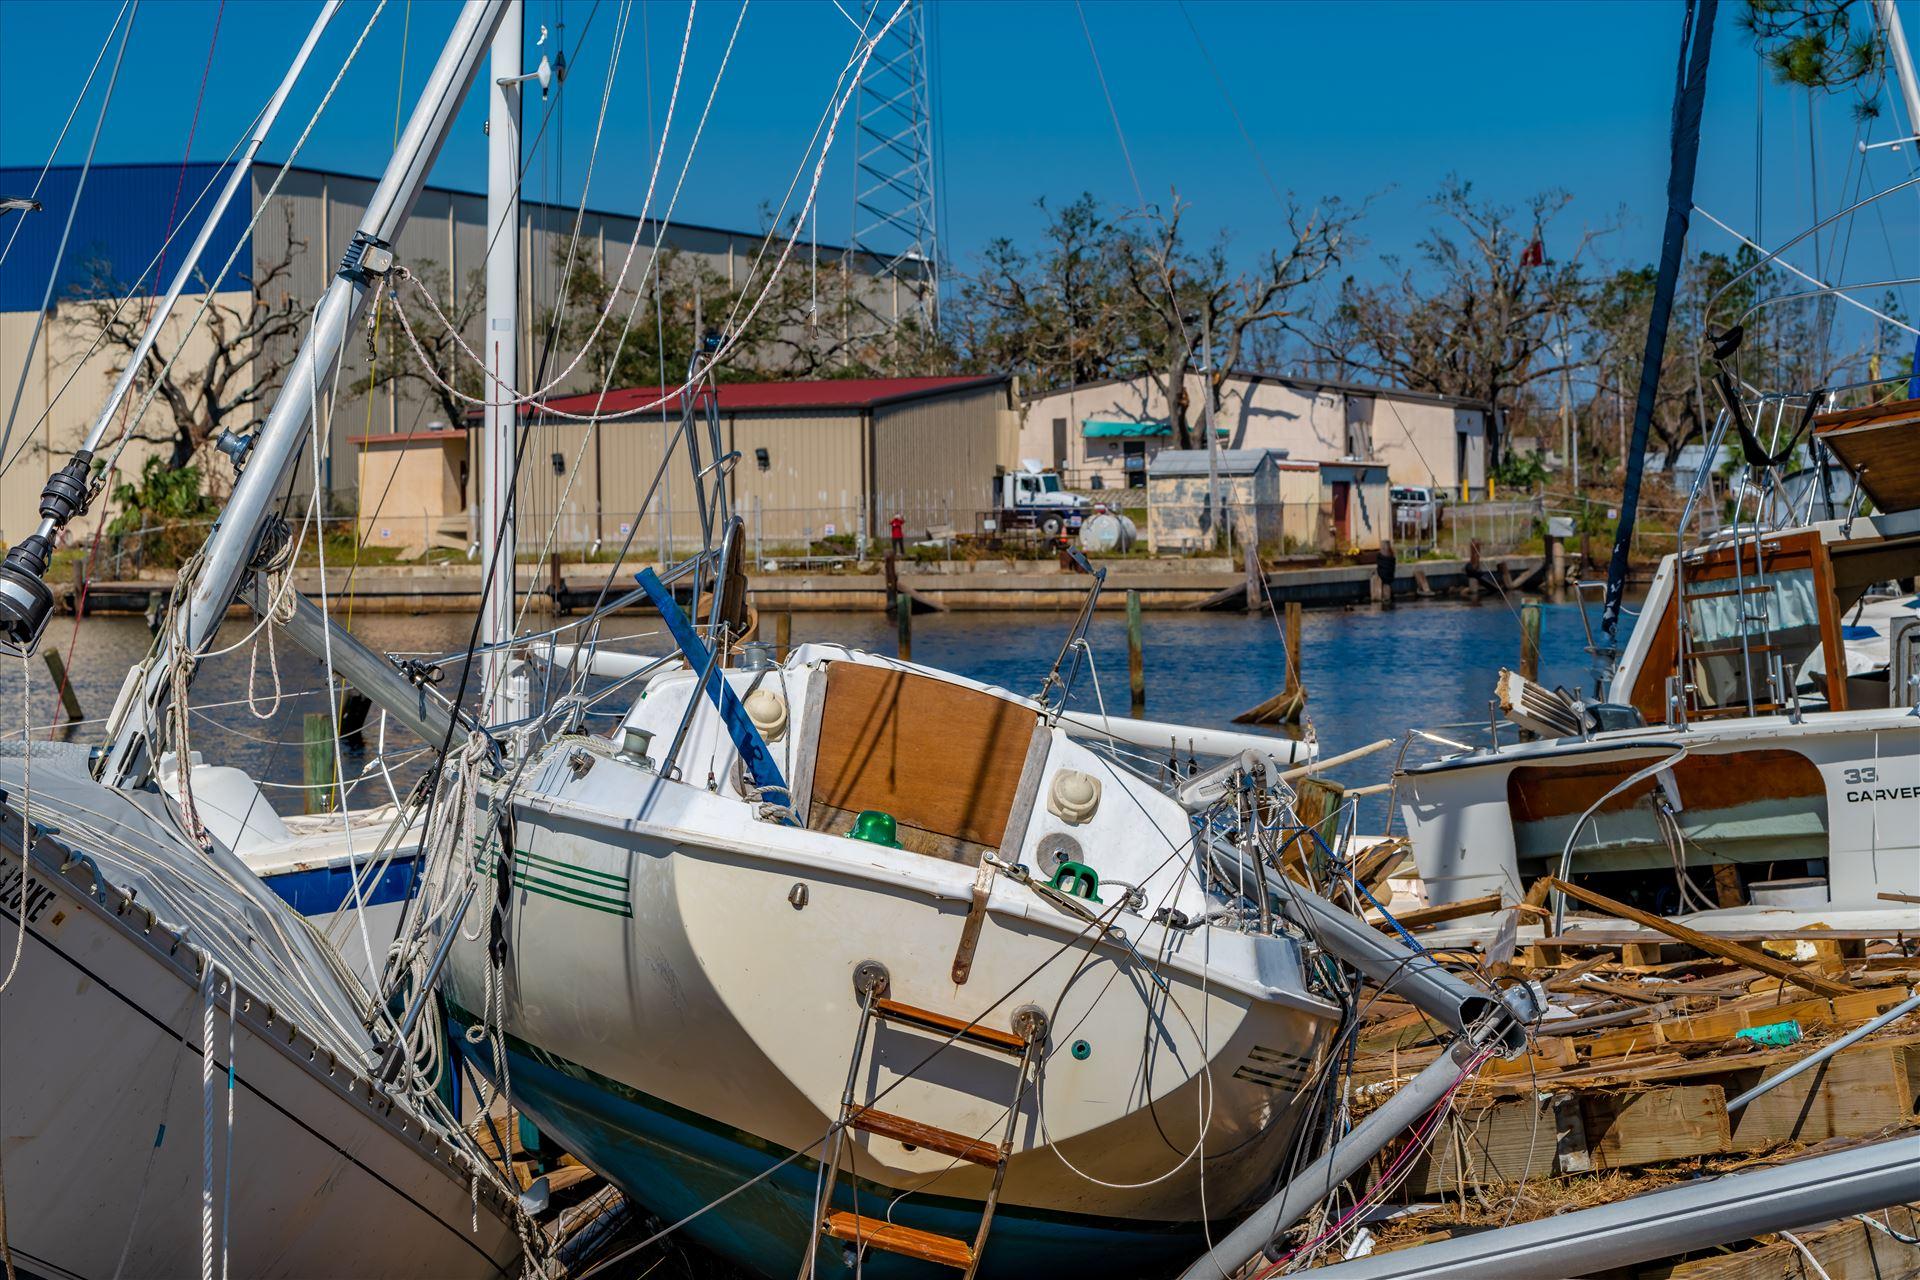 hurricane michael watson bayou panama city florida-8503348.jpg  by Terry Kelly Photography